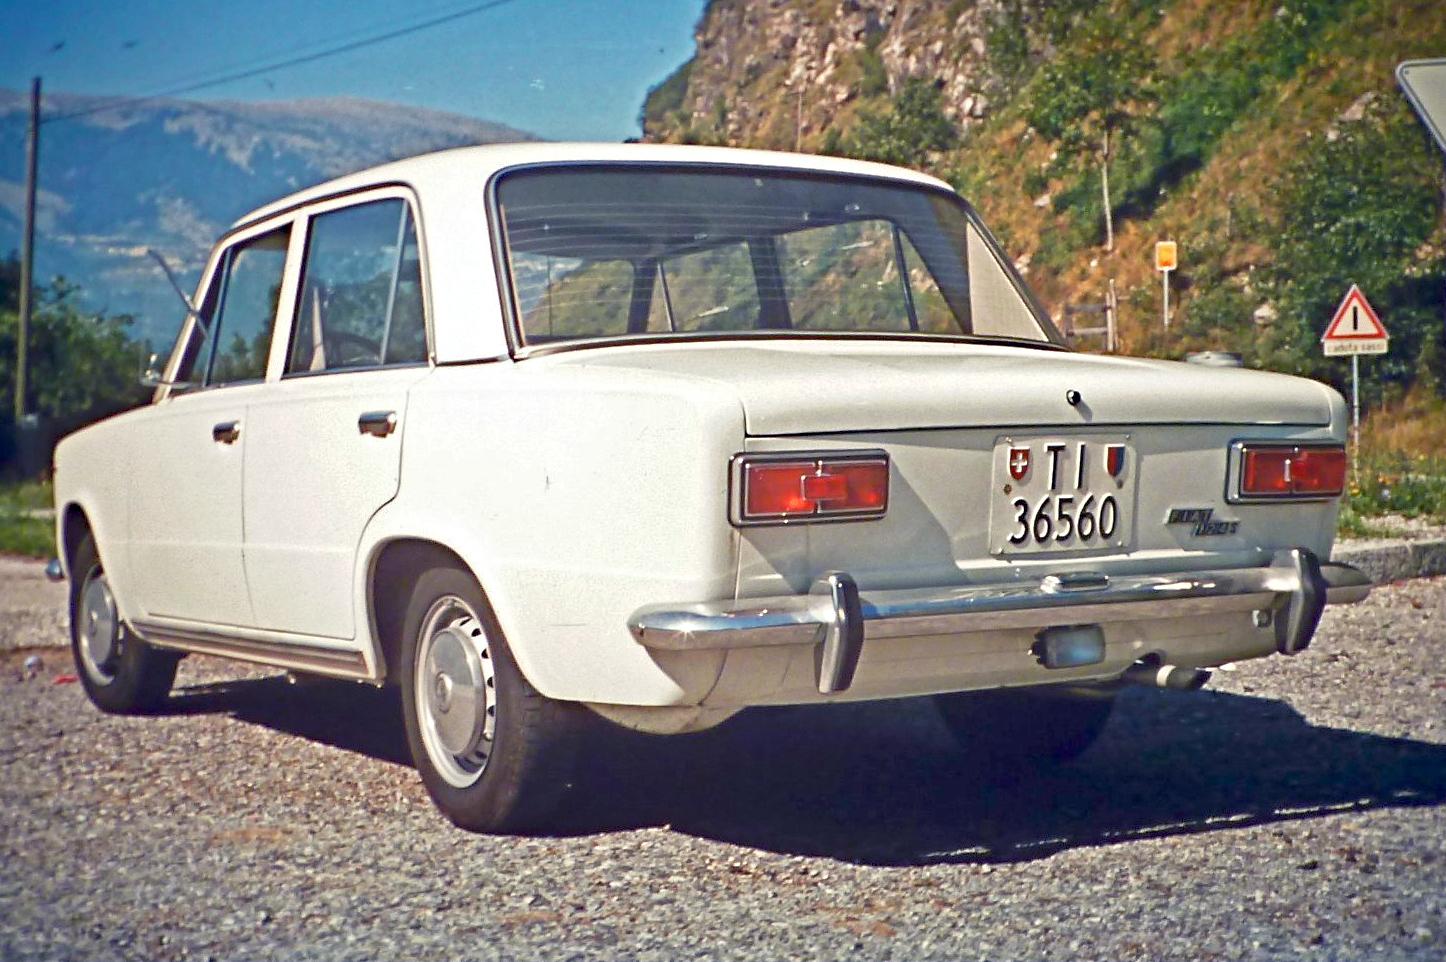 Fiat Tempra Fuse Box Schematic Diagrams Multipla Diagram 131 Trusted Wiring History Part Iv 1966 1979 Myn